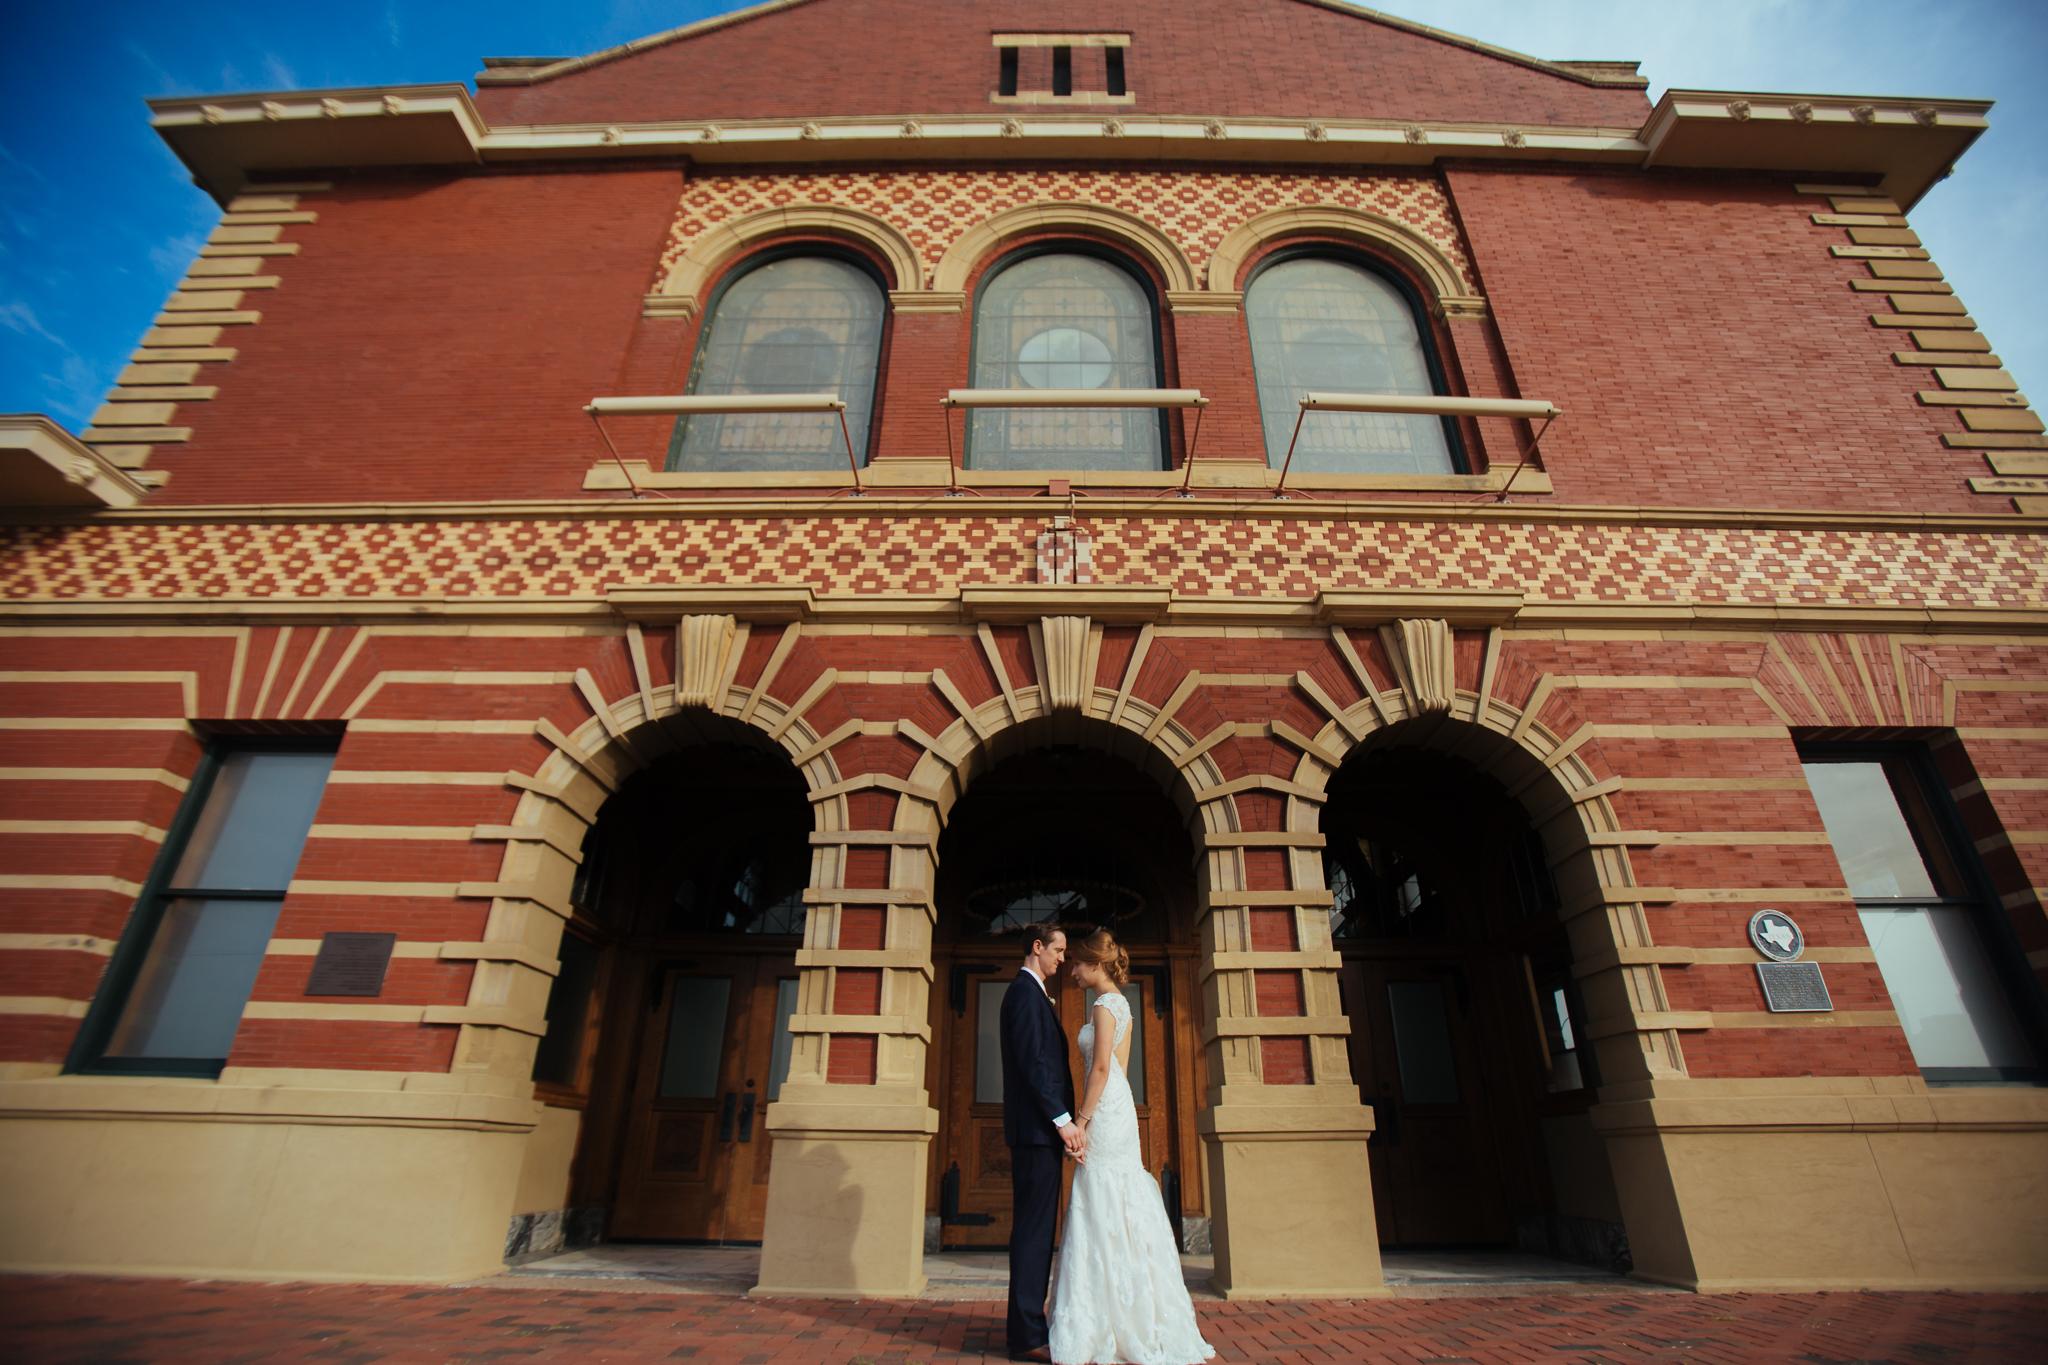 Michael and Kelly - the ashton depot - wedding DFW - wedding photographer- elizalde photography (79 of 150).jpg